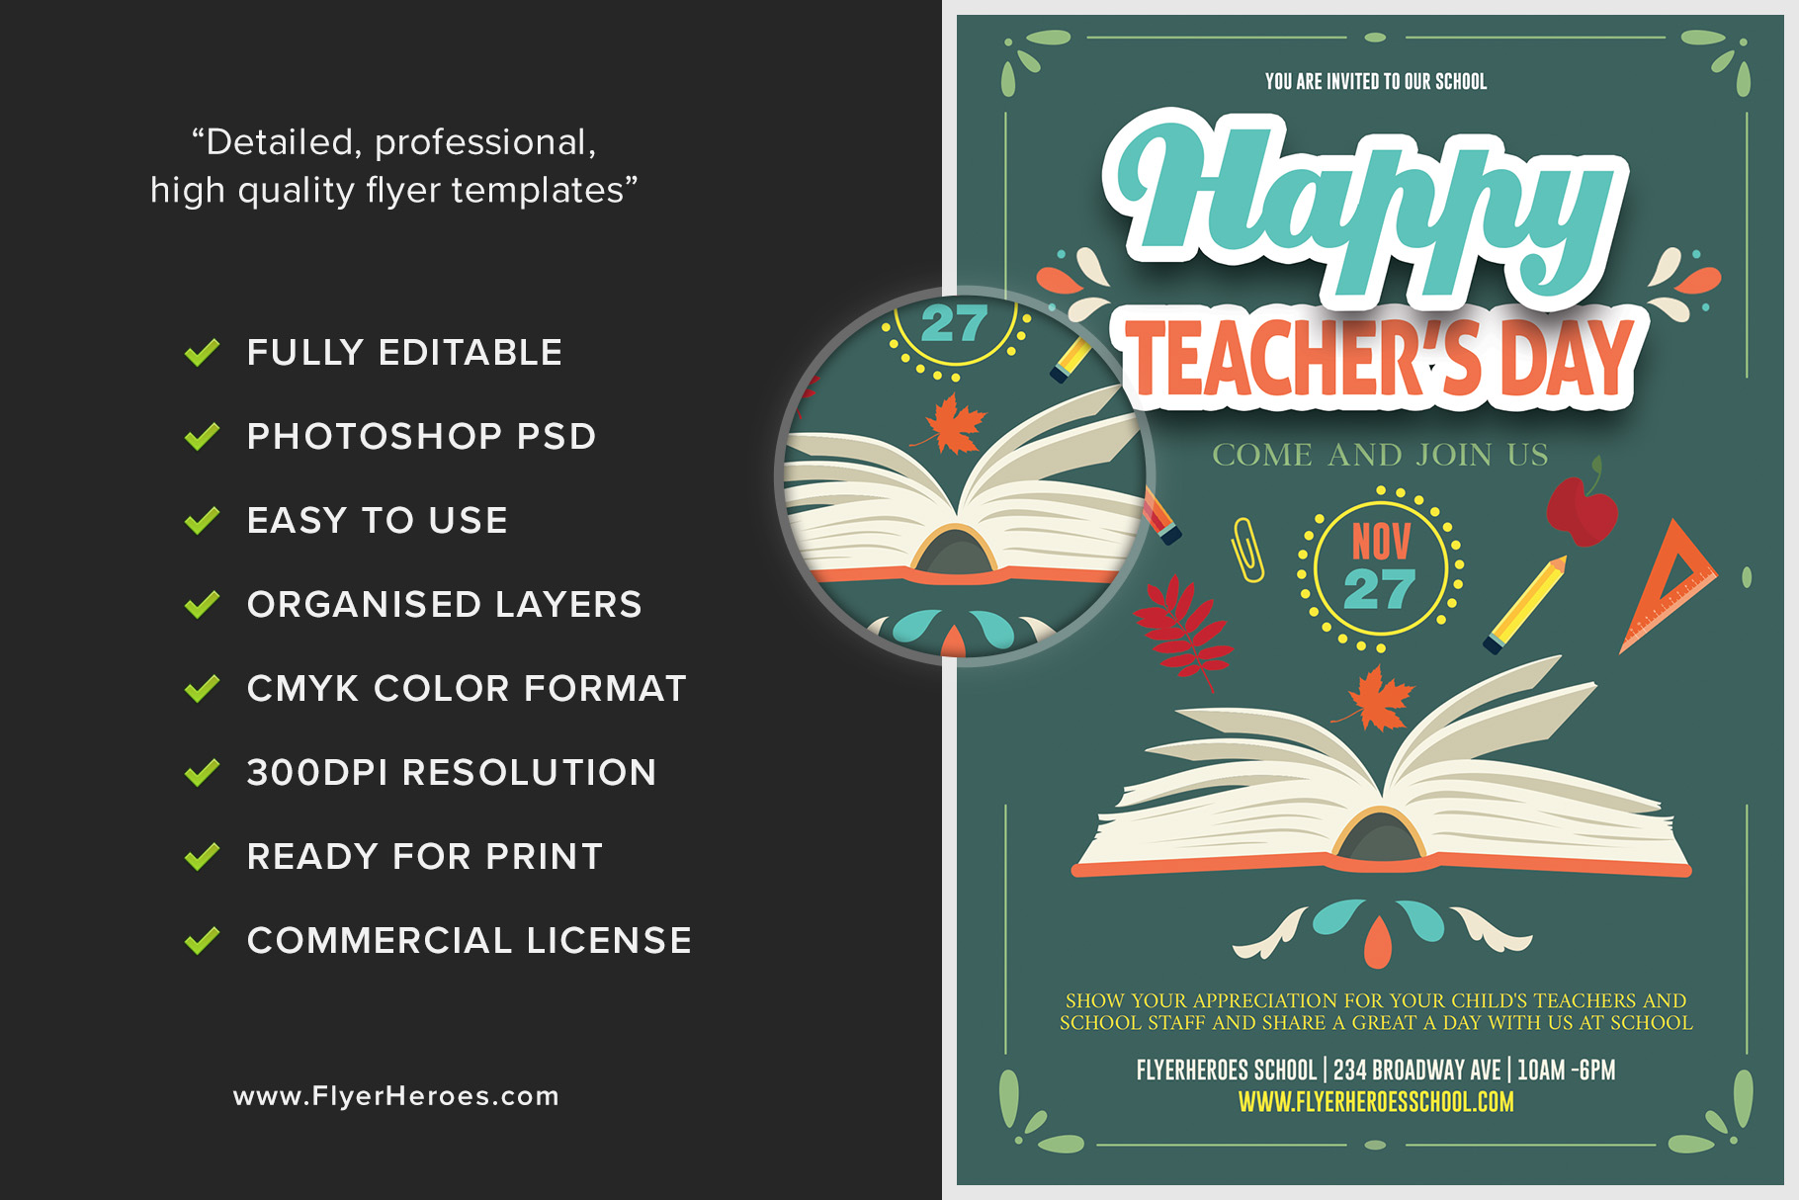 Teacher's Day Flyer Template – FlyerHeroes